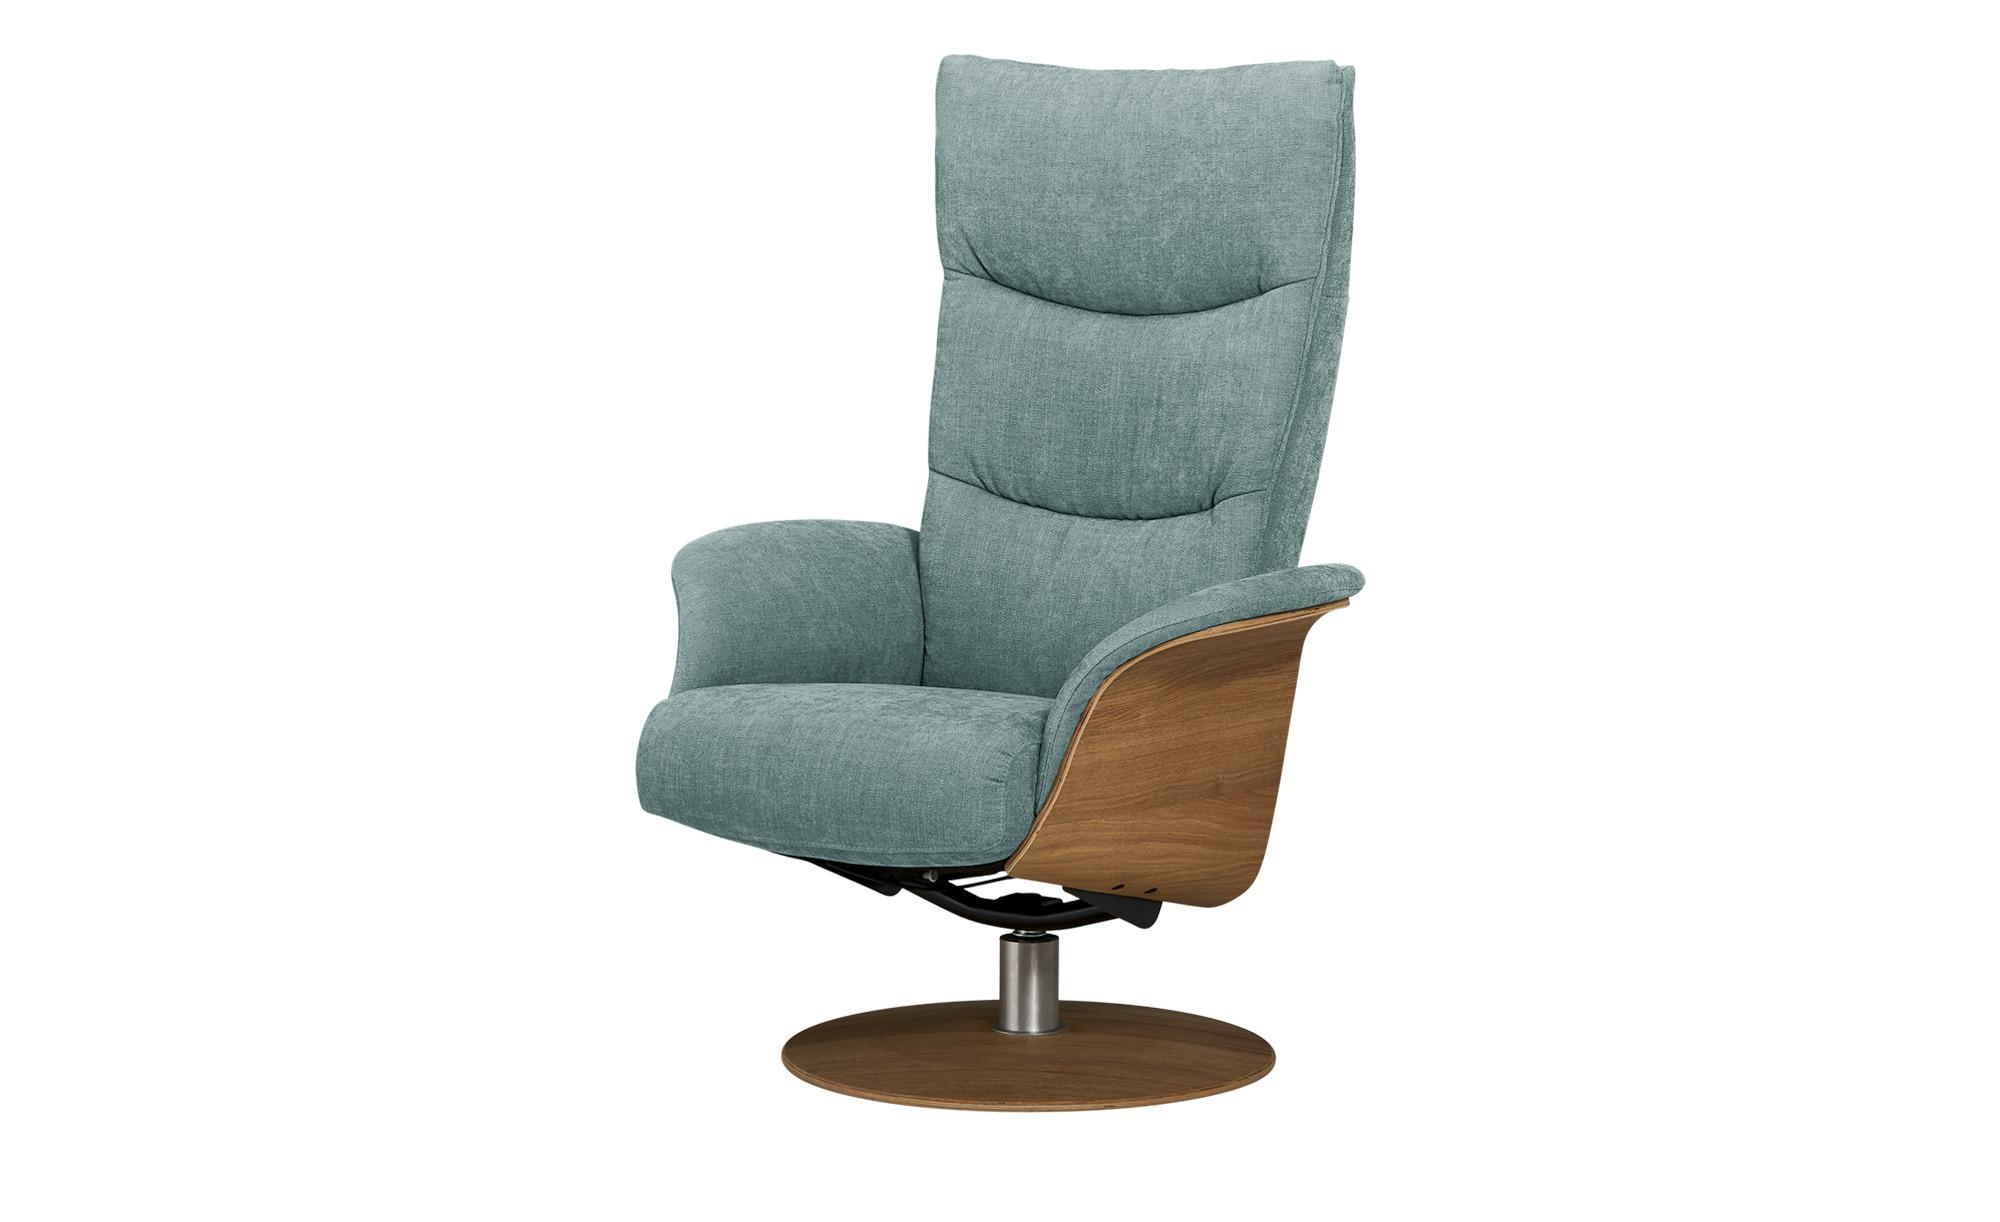 Relaxsessel  Stian ¦ blau ¦ Maße (cm): B: 77 H: 116 T: 82 Polstermöbel > Sessel > Fernsehsessel - Höffner